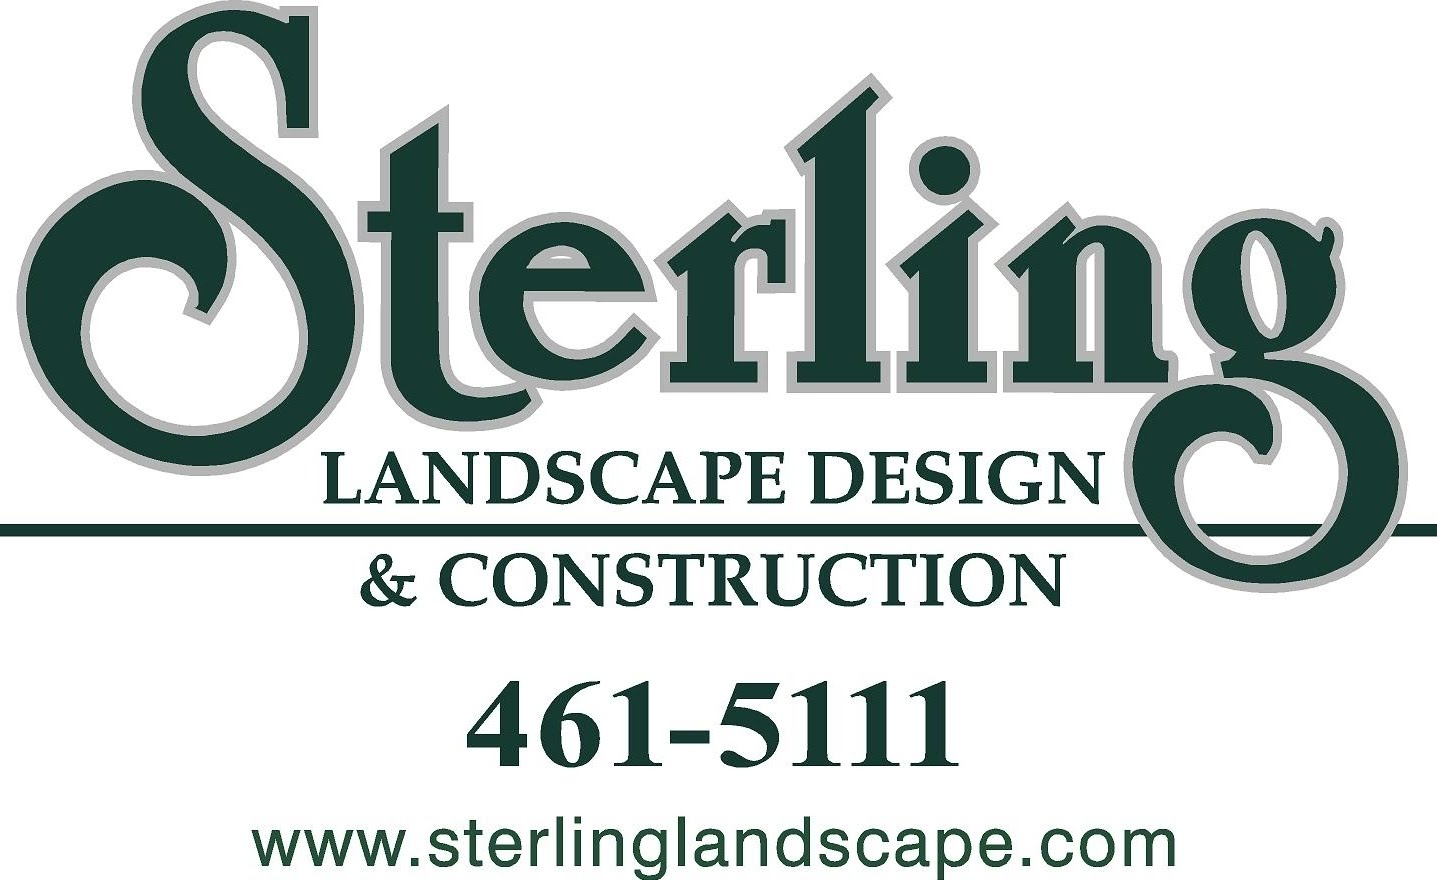 http://www.sterlinglandscape.com/